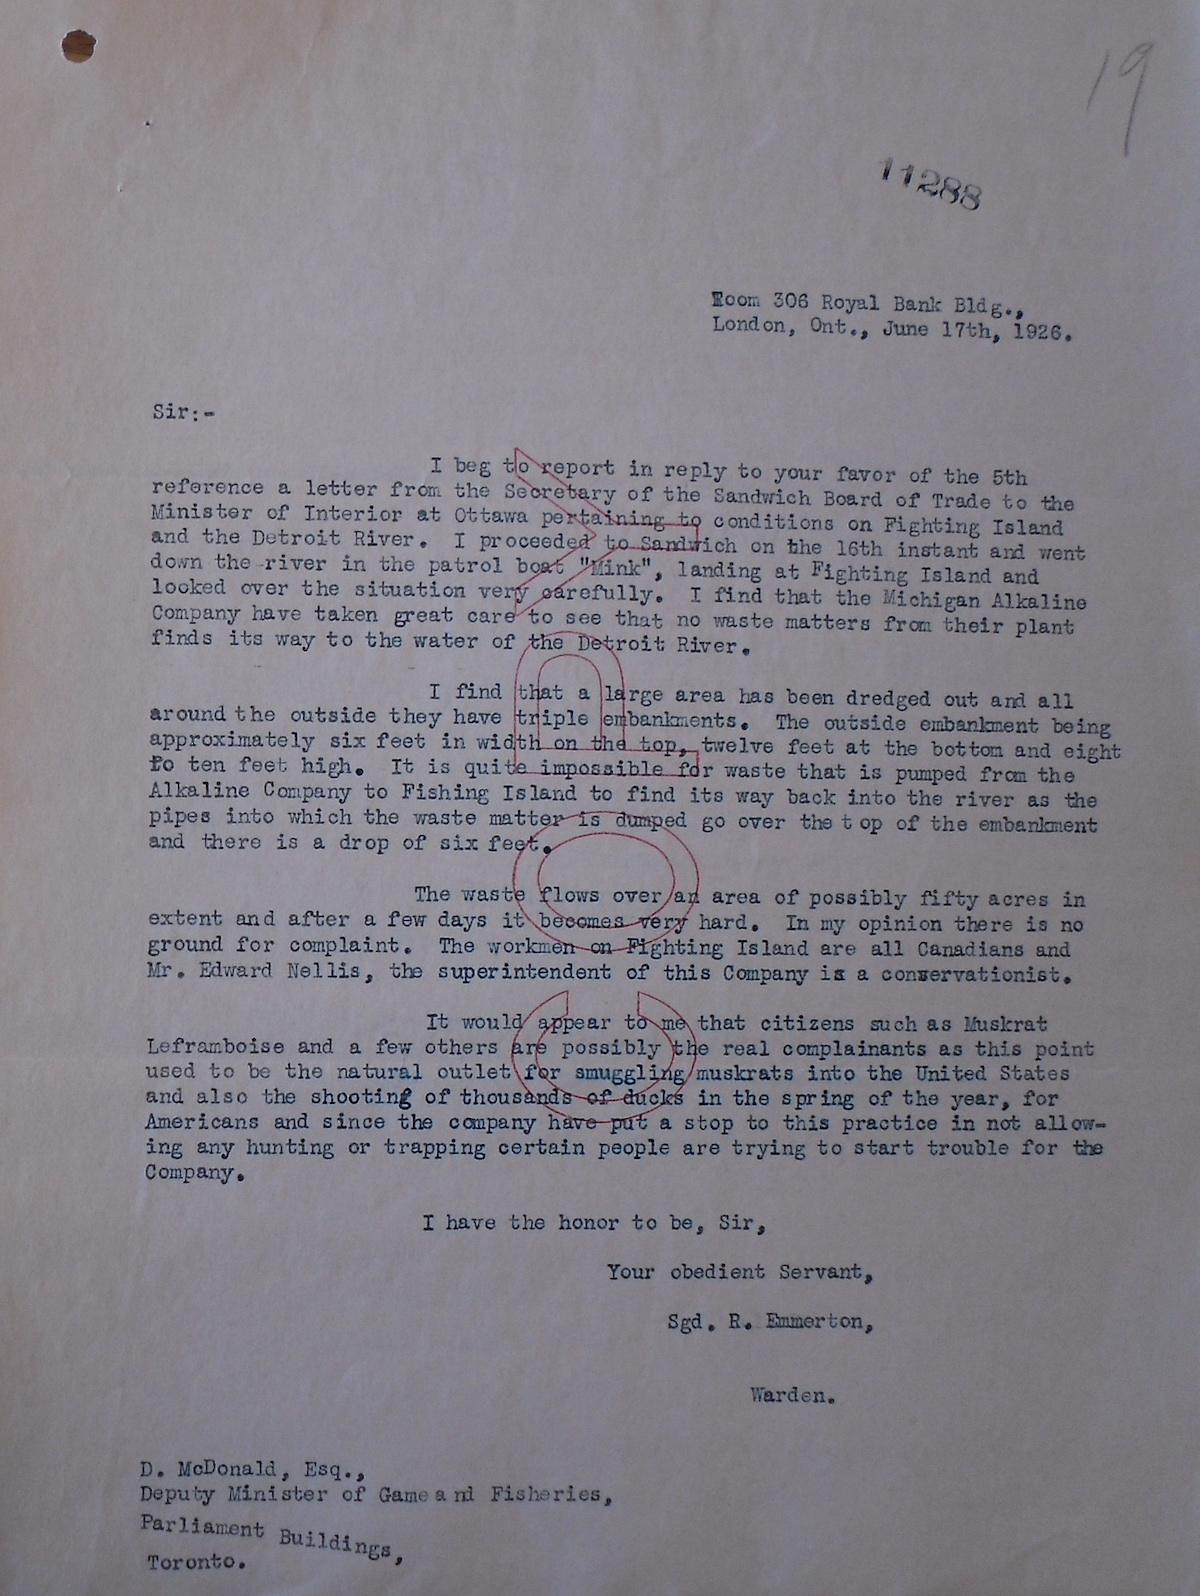 Image of Emmerton typed letter